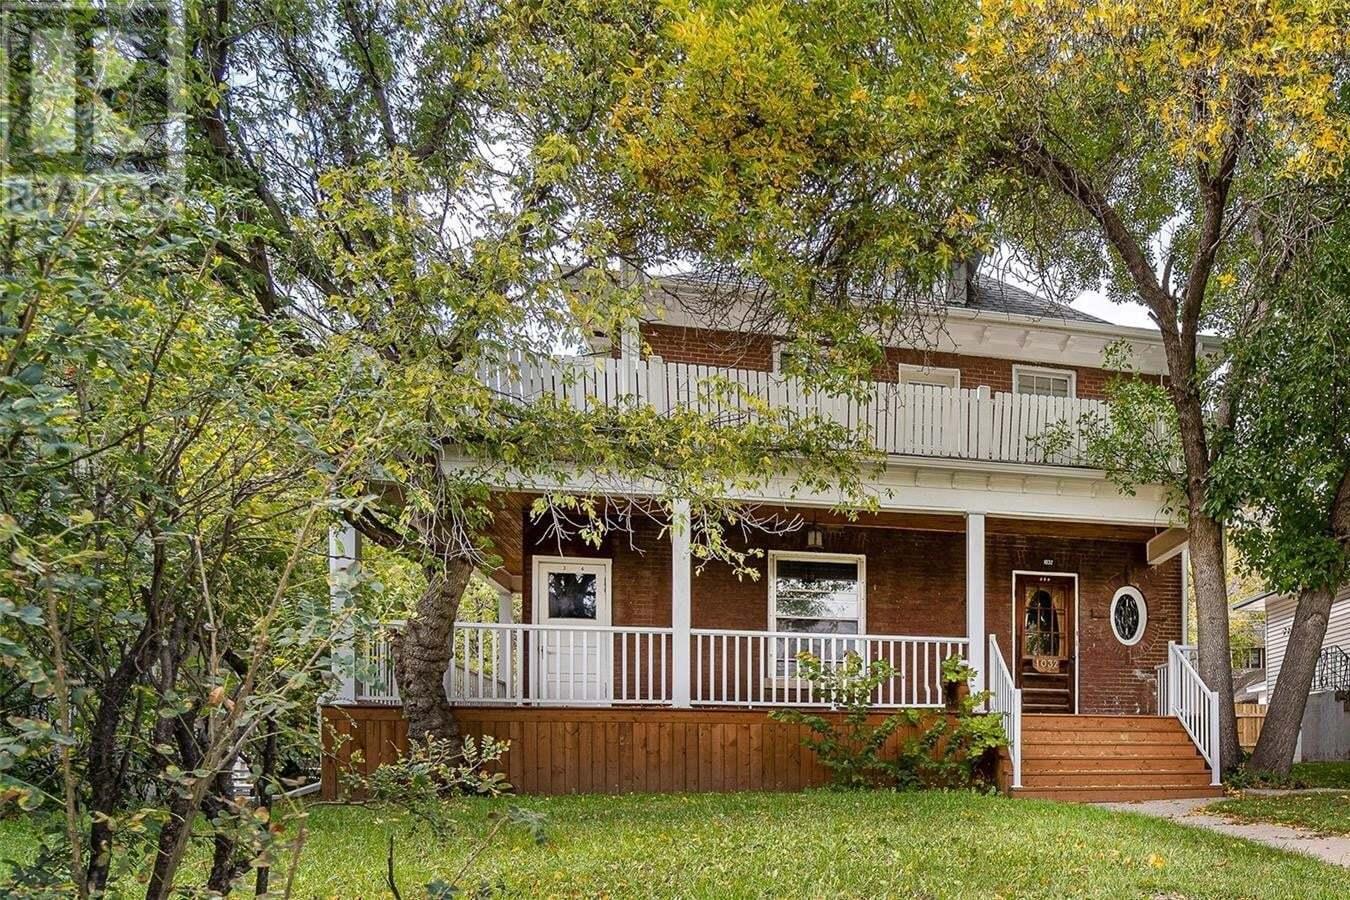 House for sale at 1032 Main St N Moose Jaw Saskatchewan - MLS: SK823541